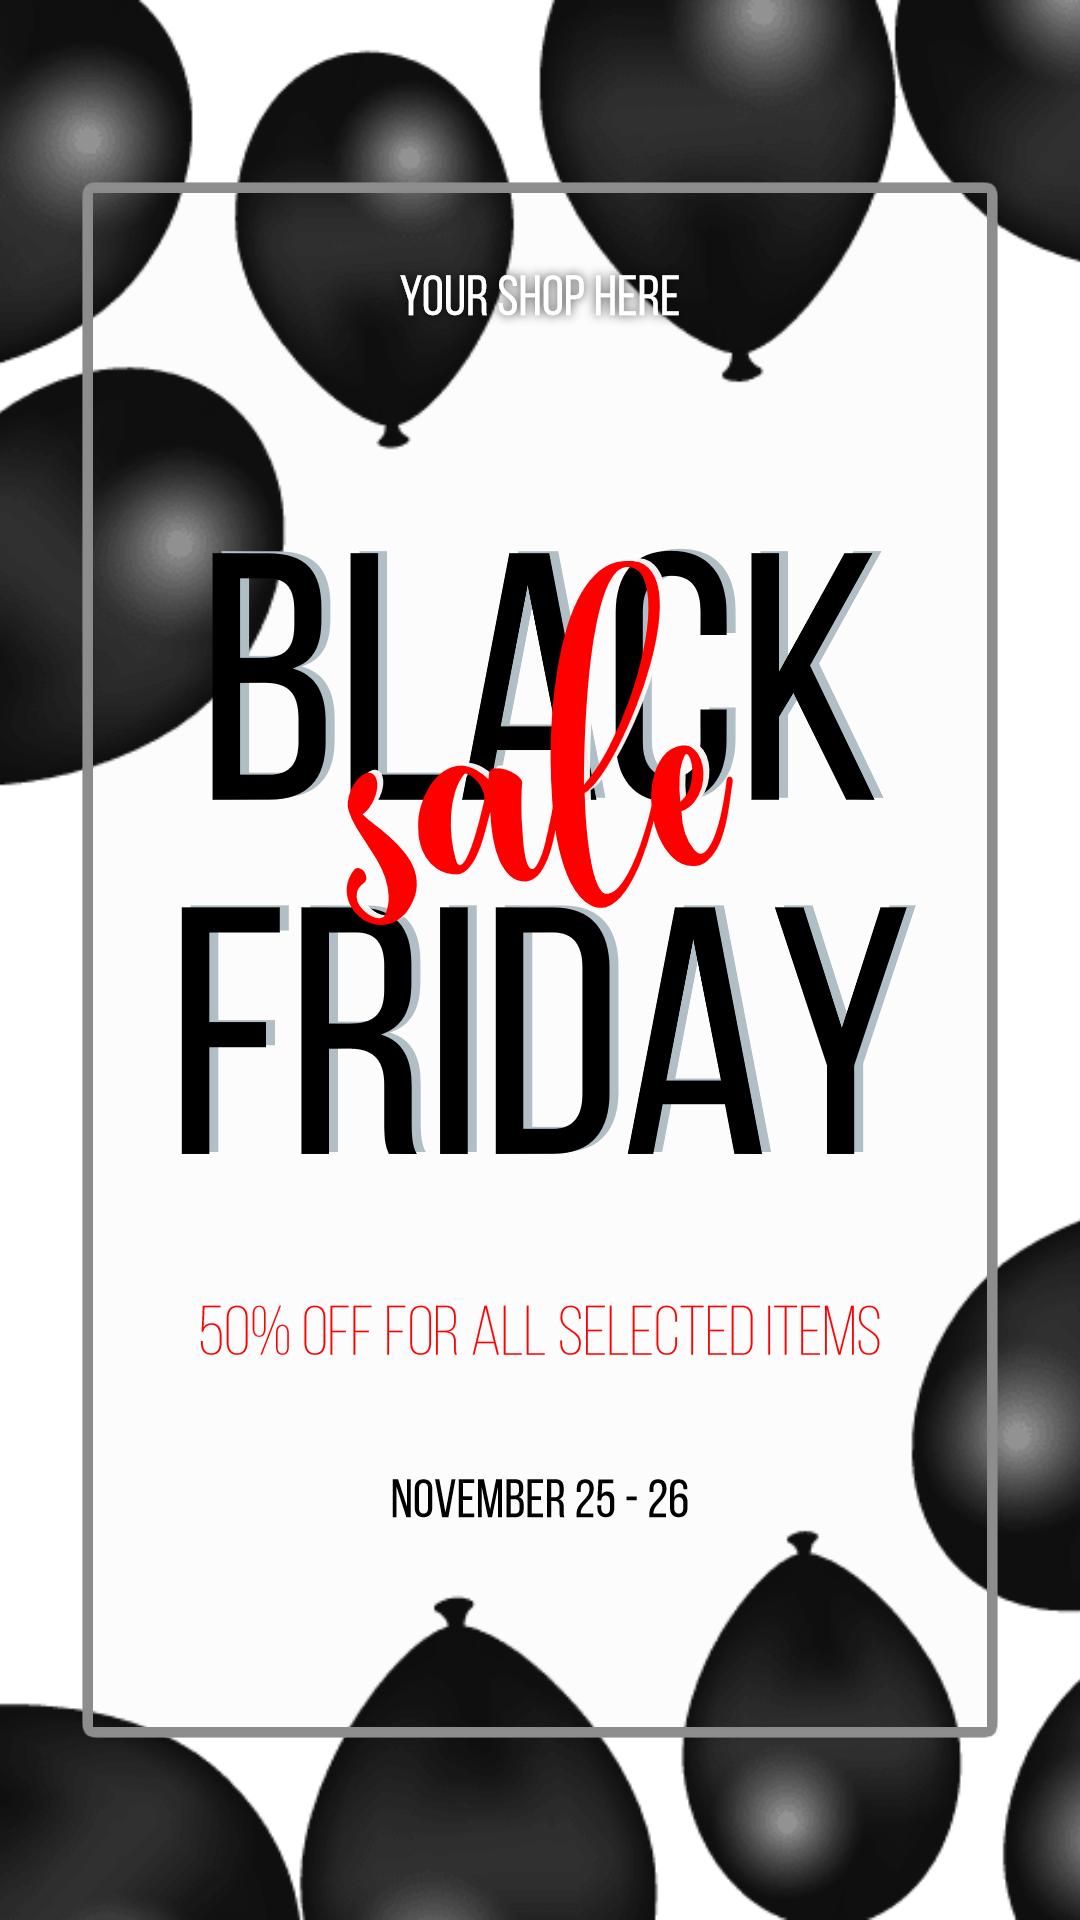 Black Friday #black friday #sale Design  Template